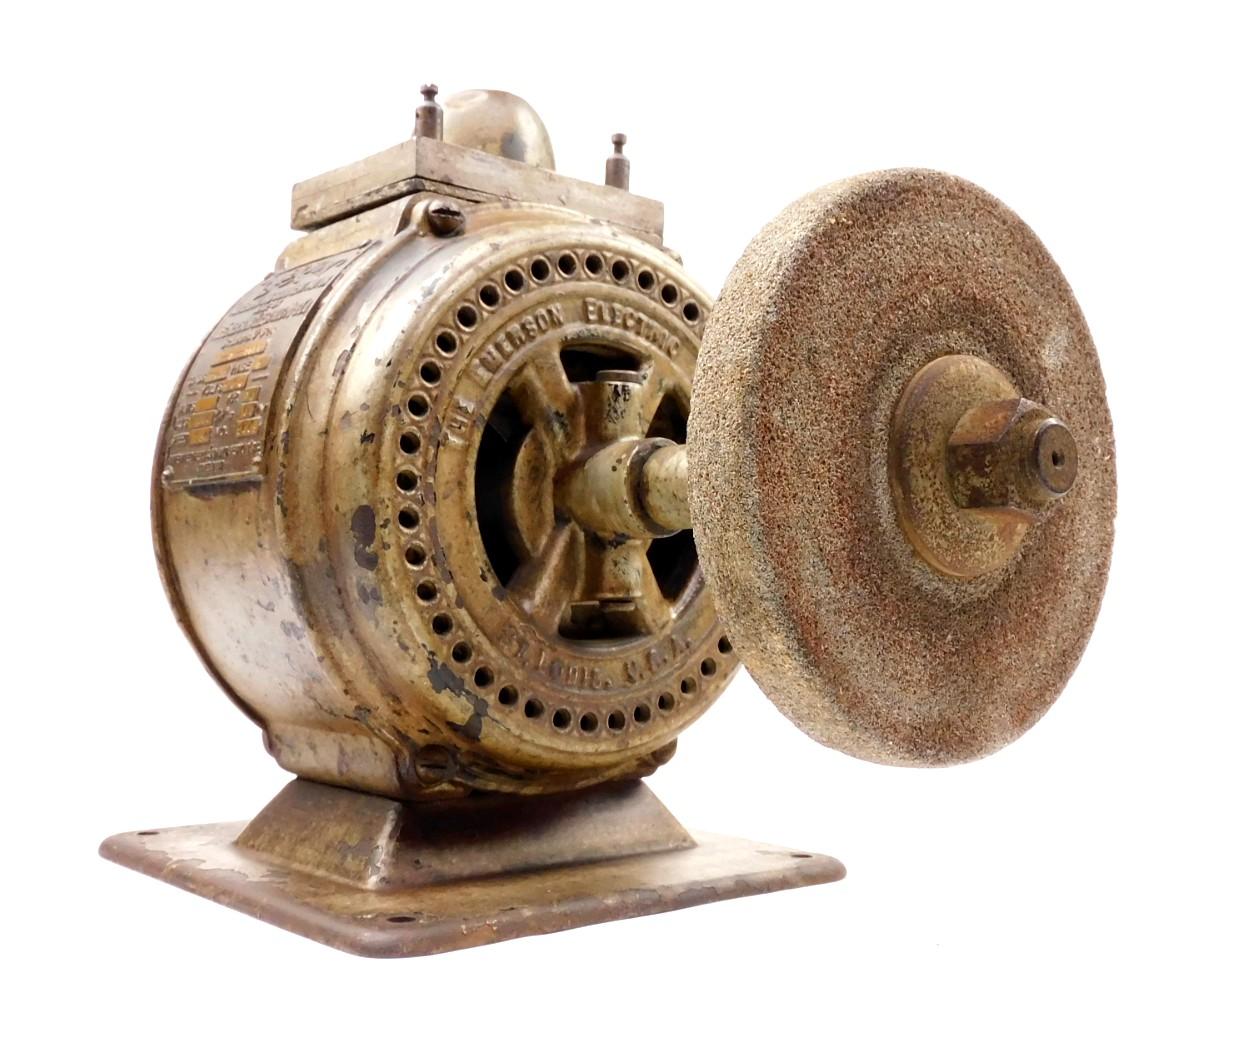 Circa 1907 Emerson 1/6 HP Motor With Grinding Wheel